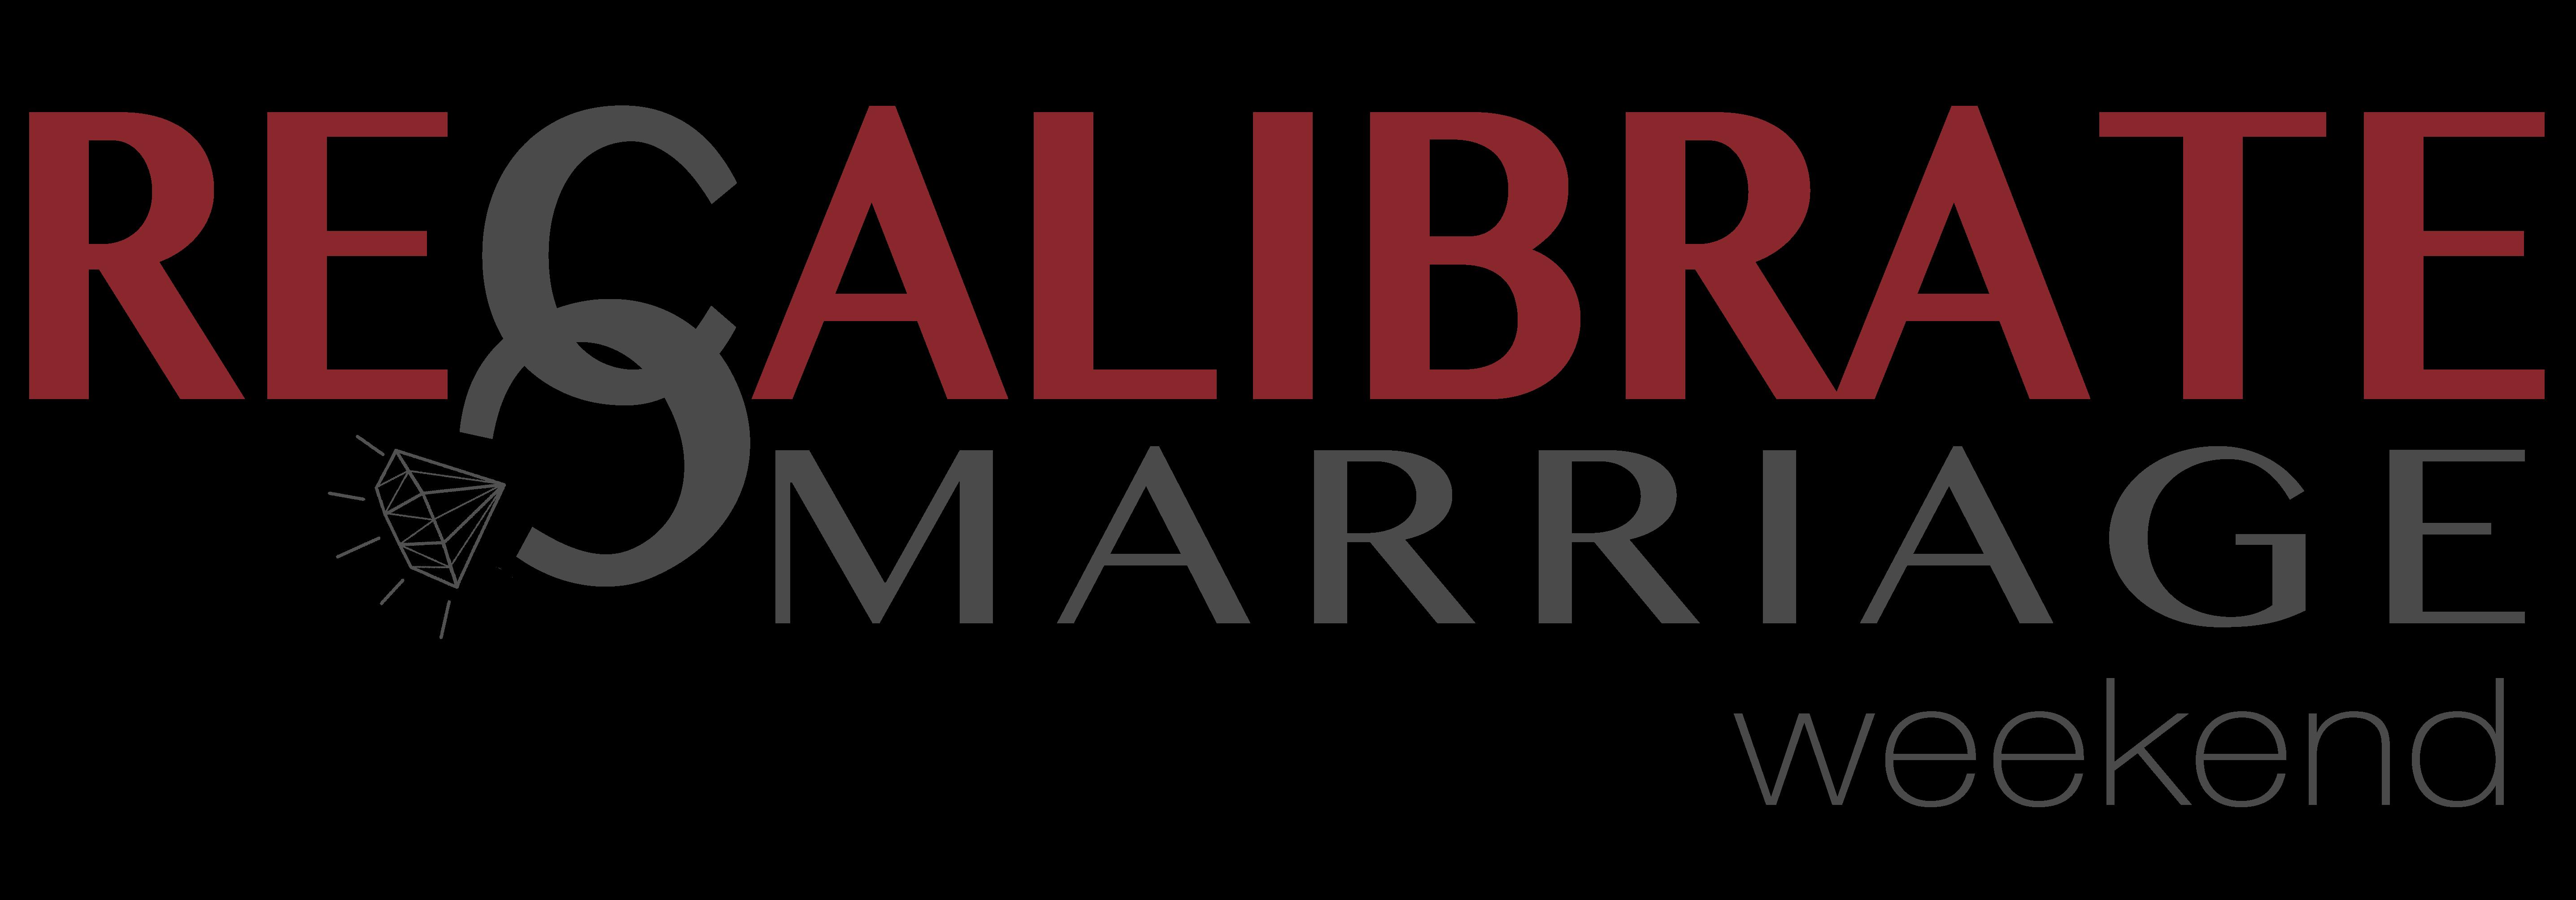 Recalibrate marriage logo